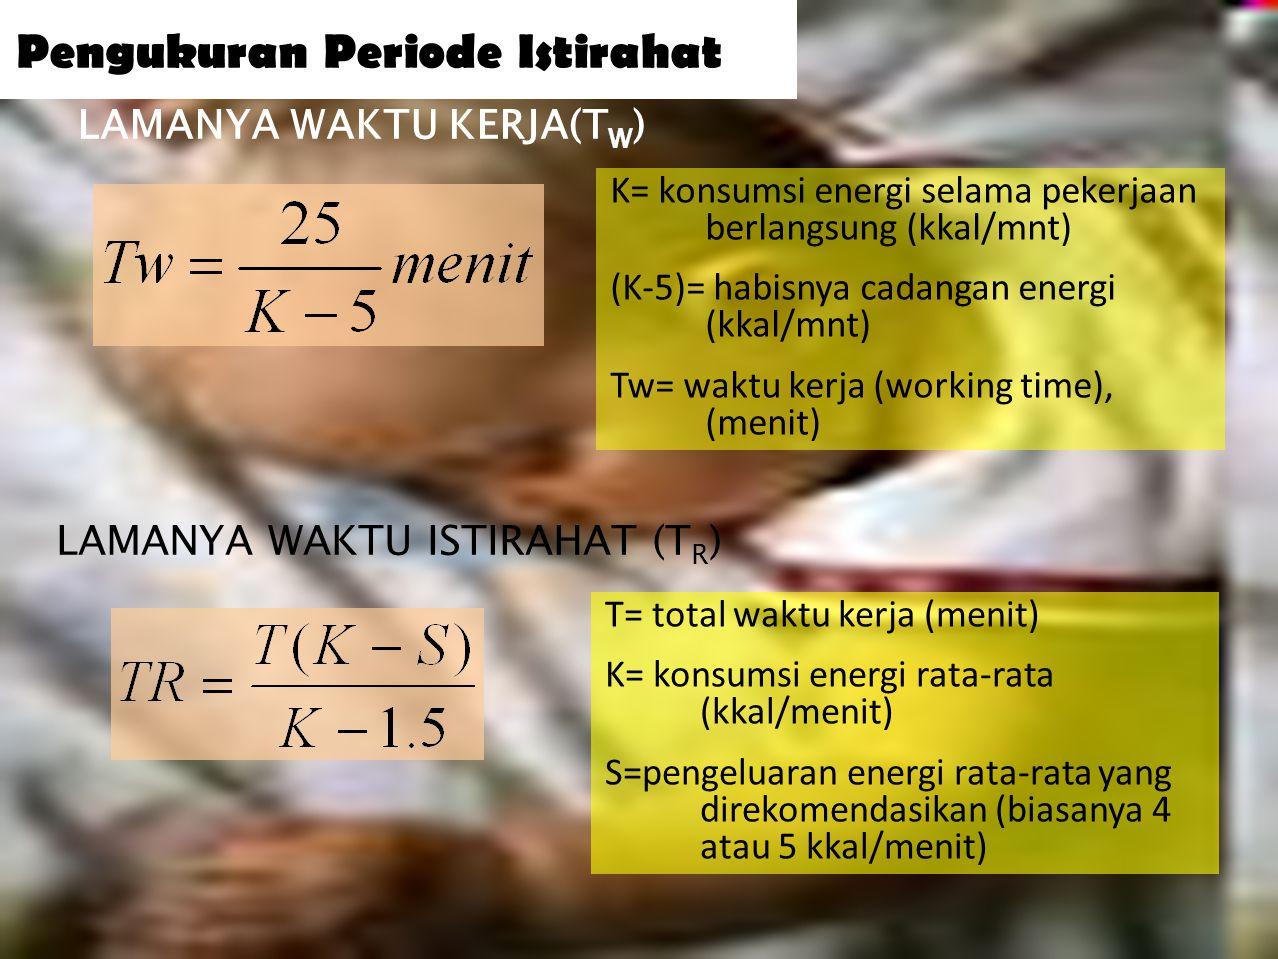 34 Pengukuran Periode Istirahat  Murrel (1965), tubuh masih punya cadangan 25kcal sebelum muncul asam laktat  Jika bekerja >5,2 kcal/menit cadangan energi akan hilang  1 L oksigen setara dengan 4,8 kcal  Berdasarkan kapasitas oksigen R= T(b-s)/(b-0.3) R= istirahat yang dibutuhkan (menit) T= panjang periode kerja (menit) b= kapasitas oksigen saat kerja(L/min) s= kapasitas oksigen saat istirahat (L/min)